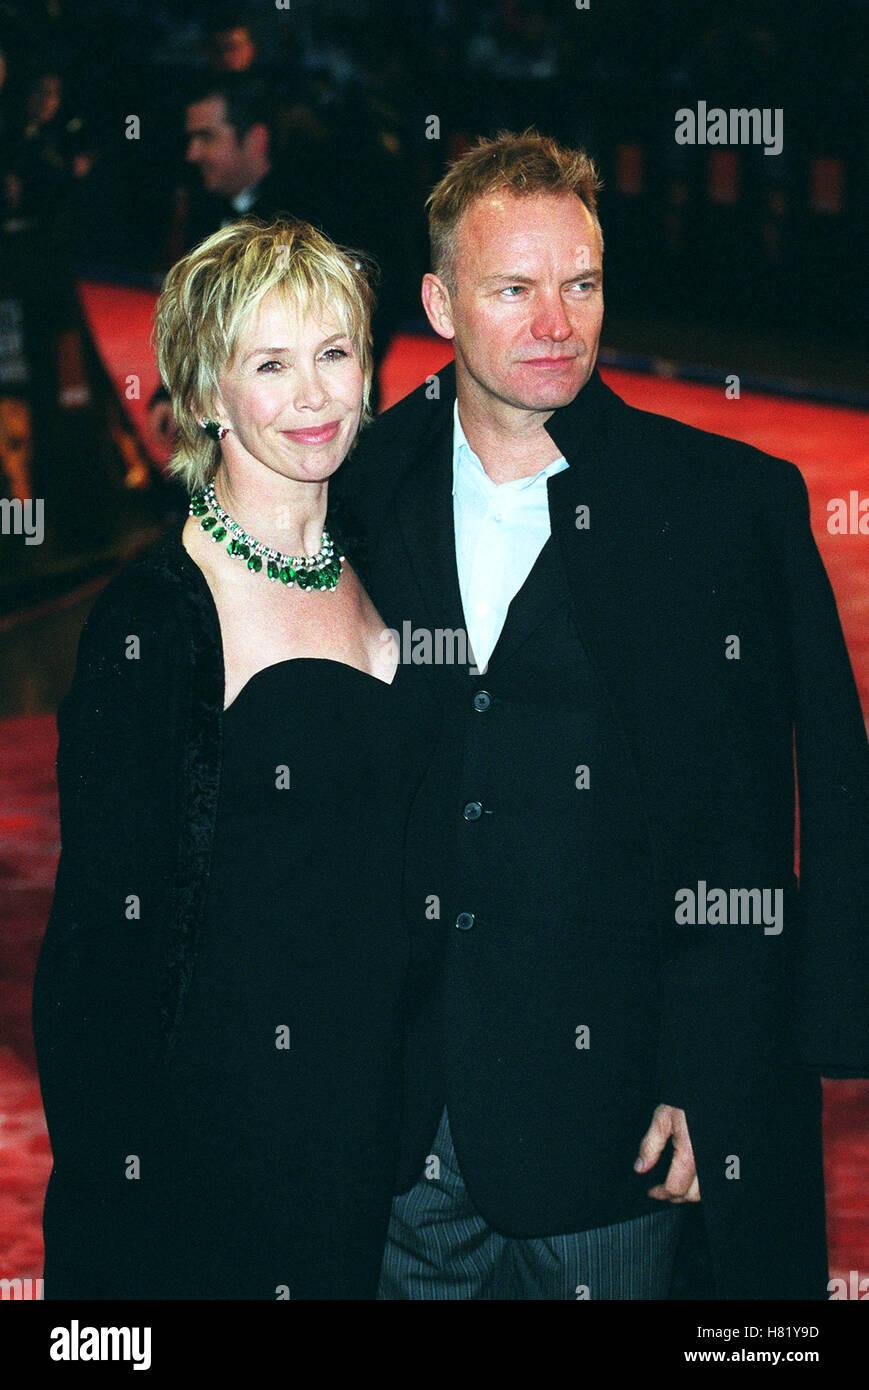 STING & TRUDIE STYLER BAFTA FILM AWARDS BAFTA FILM AWARDS Londra Inghilterra 24 Febbraio 2002 Foto Stock